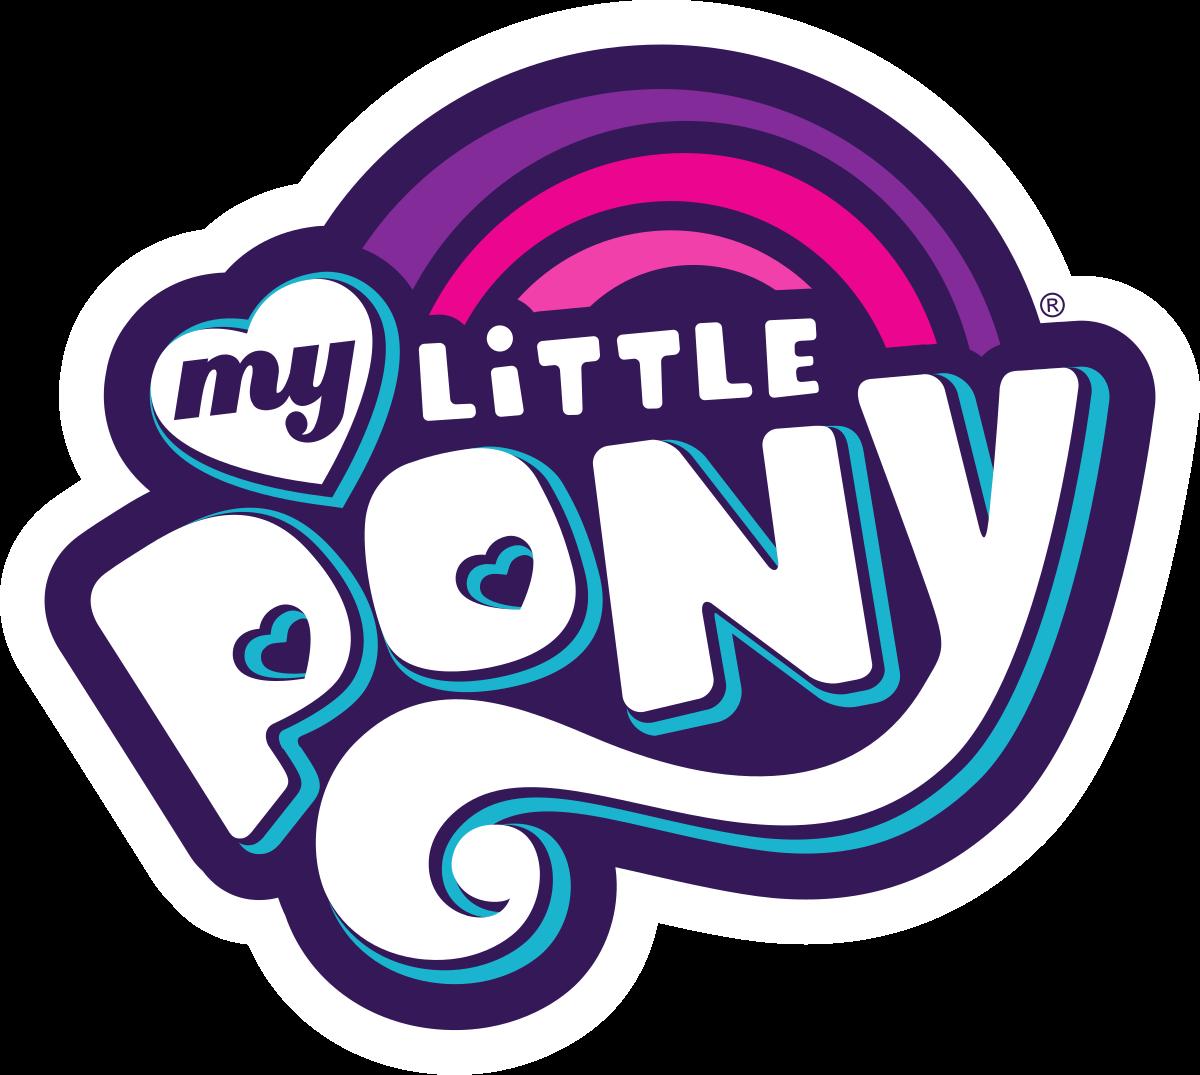 Drawn my little pony small Wikipedia Little Pony My